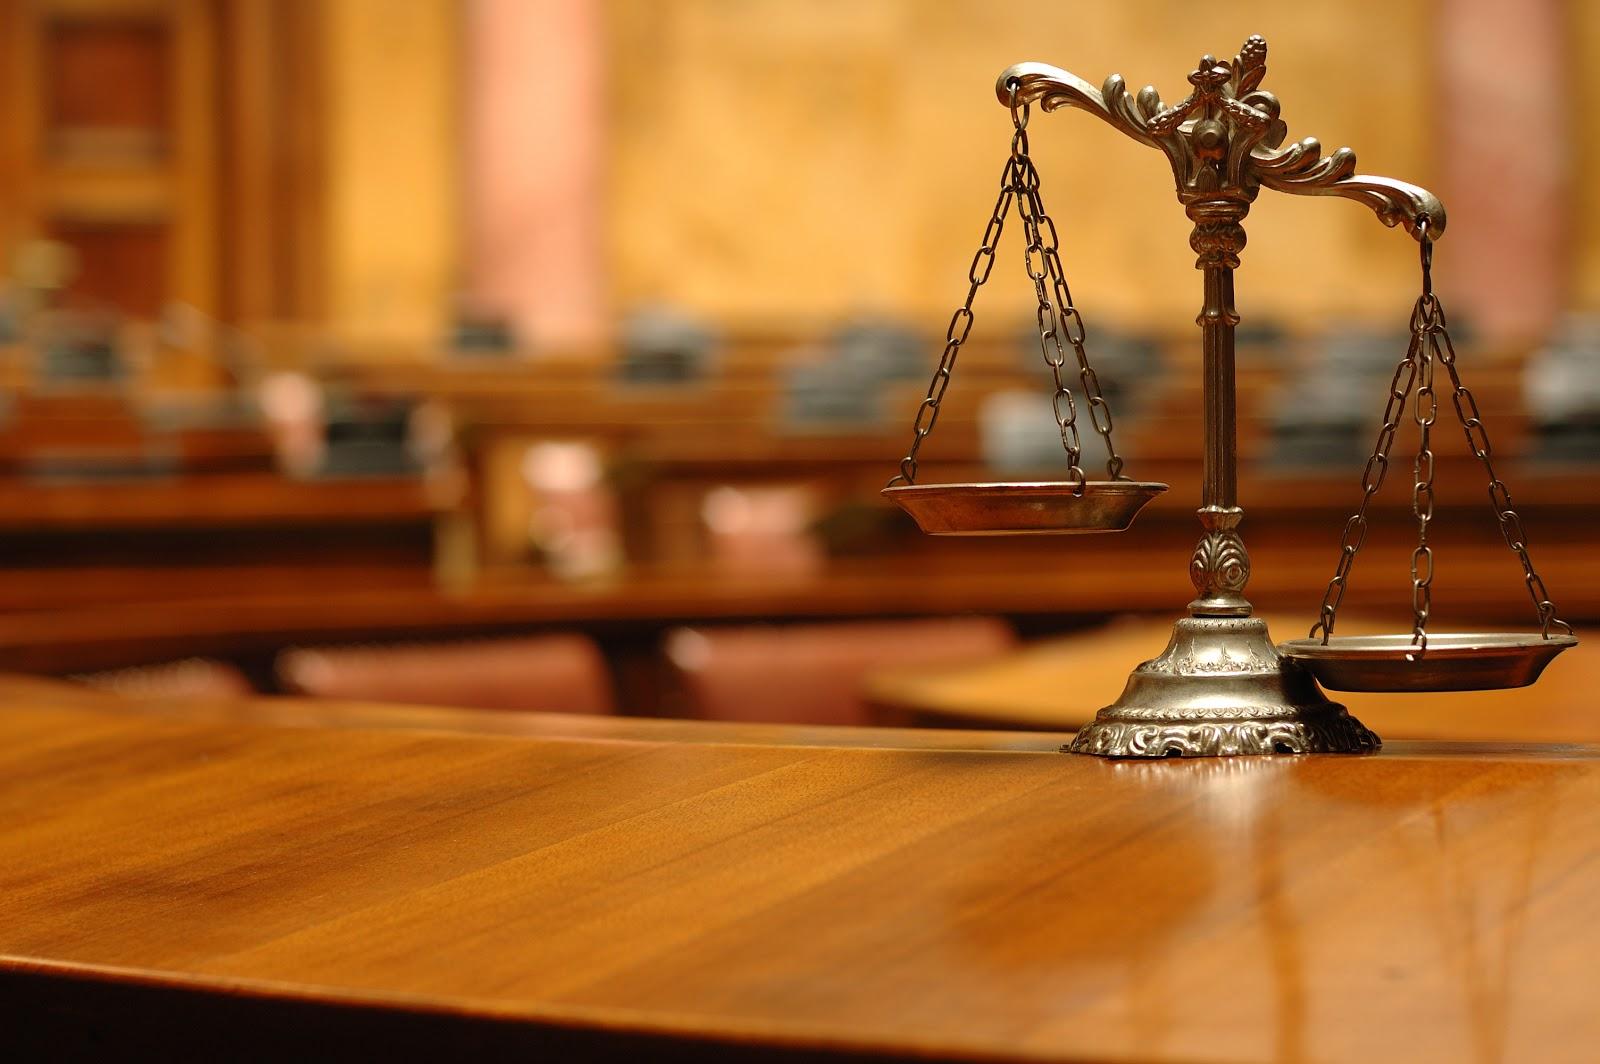 Jelaskan Perbedaan antara hak dan kewajiban asasi manusia